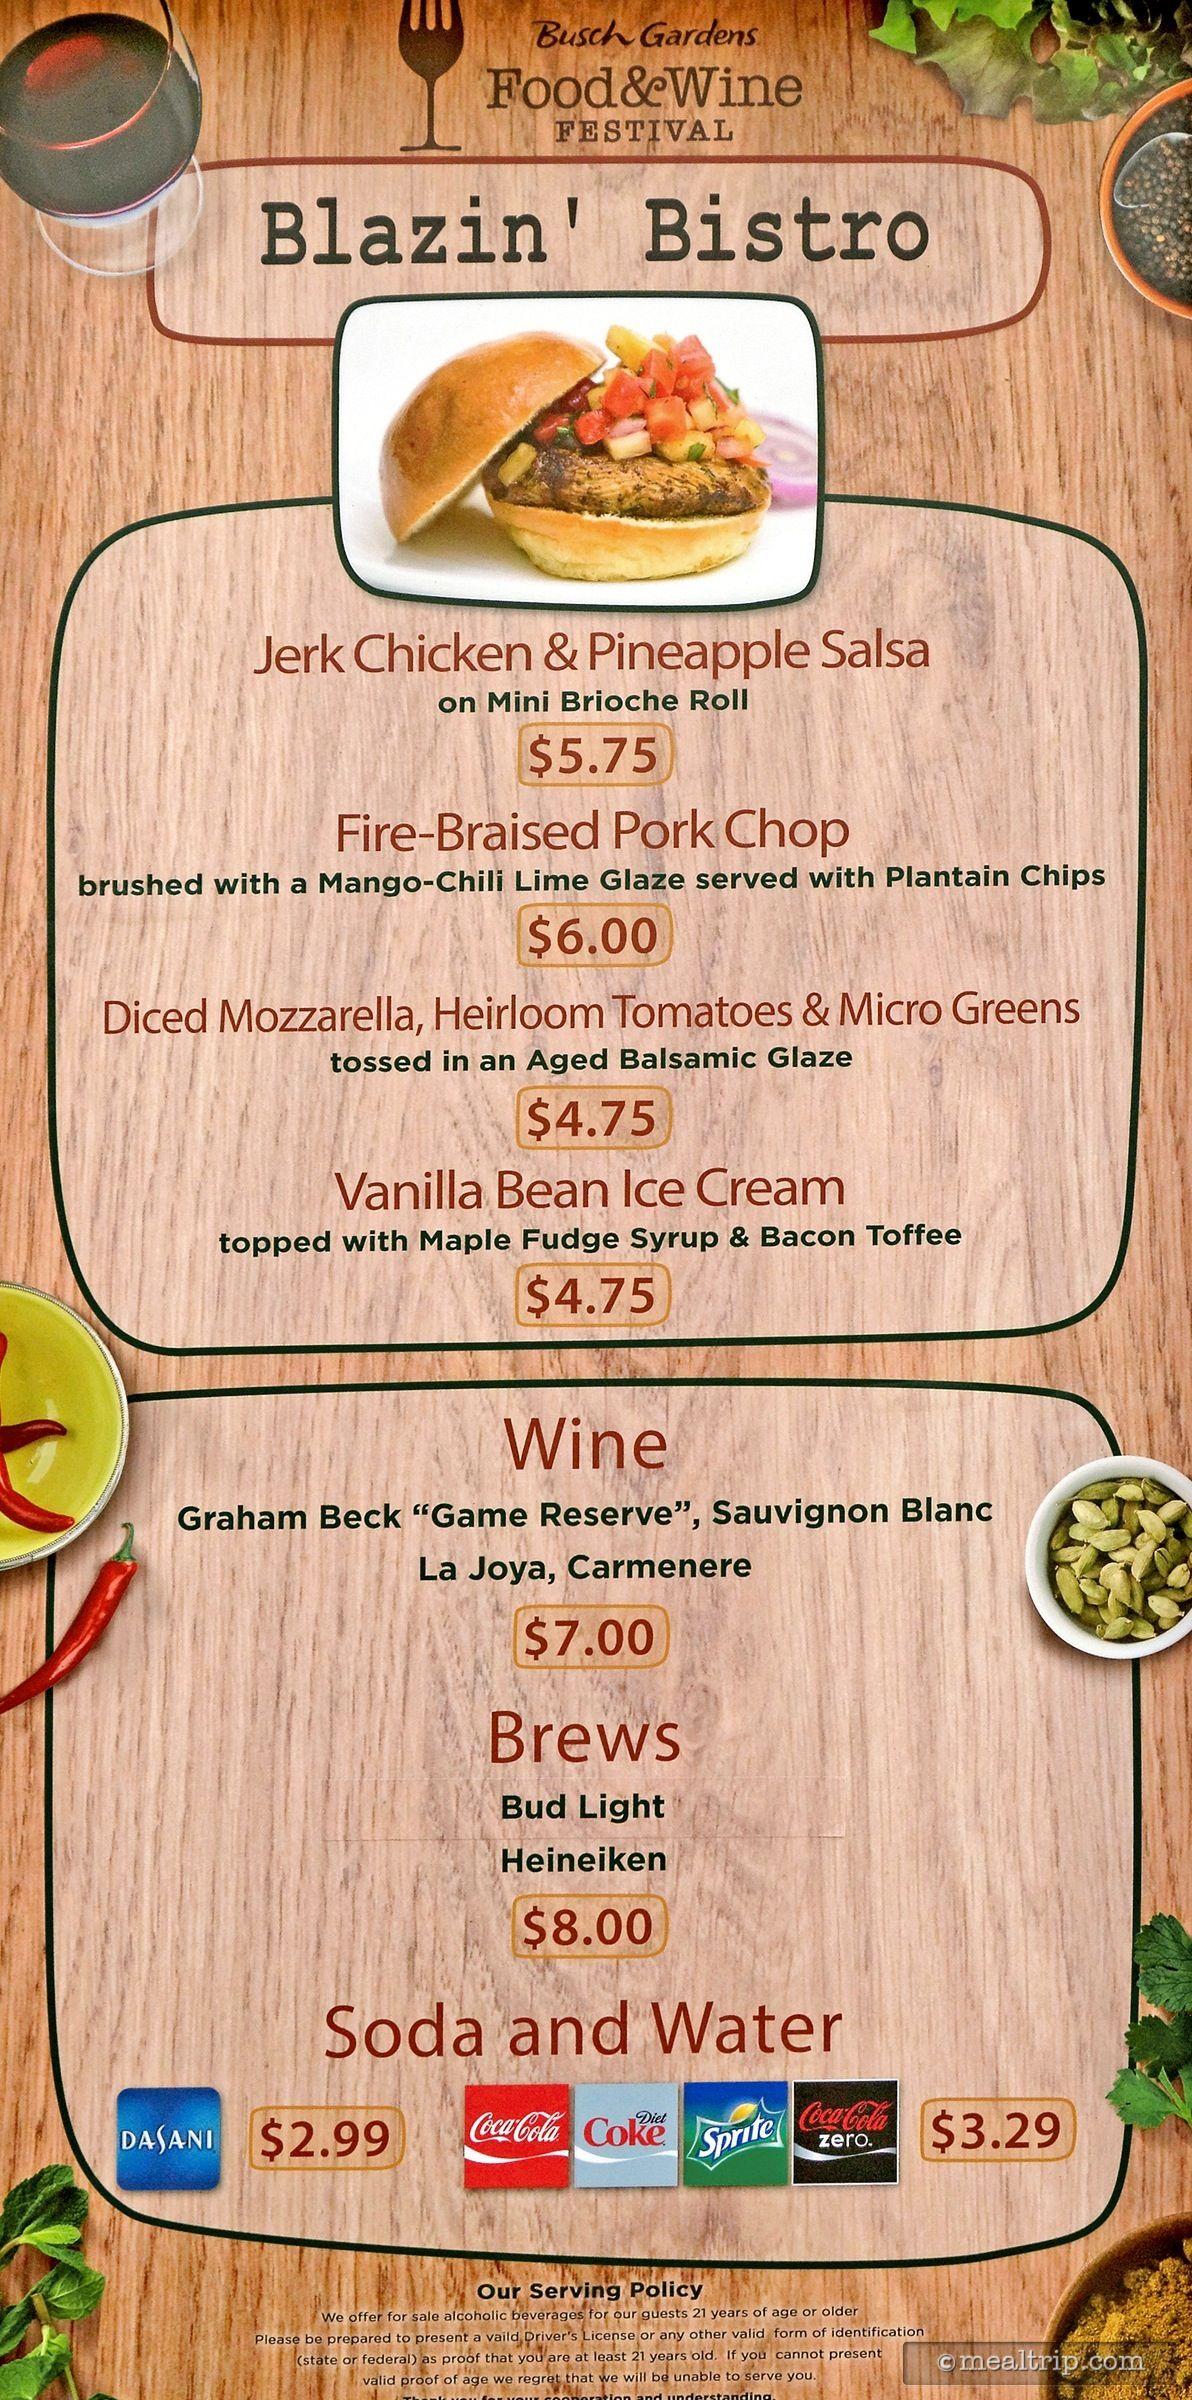 the blazin u0027 bistro menu from the 2015 busch gardens food and wine